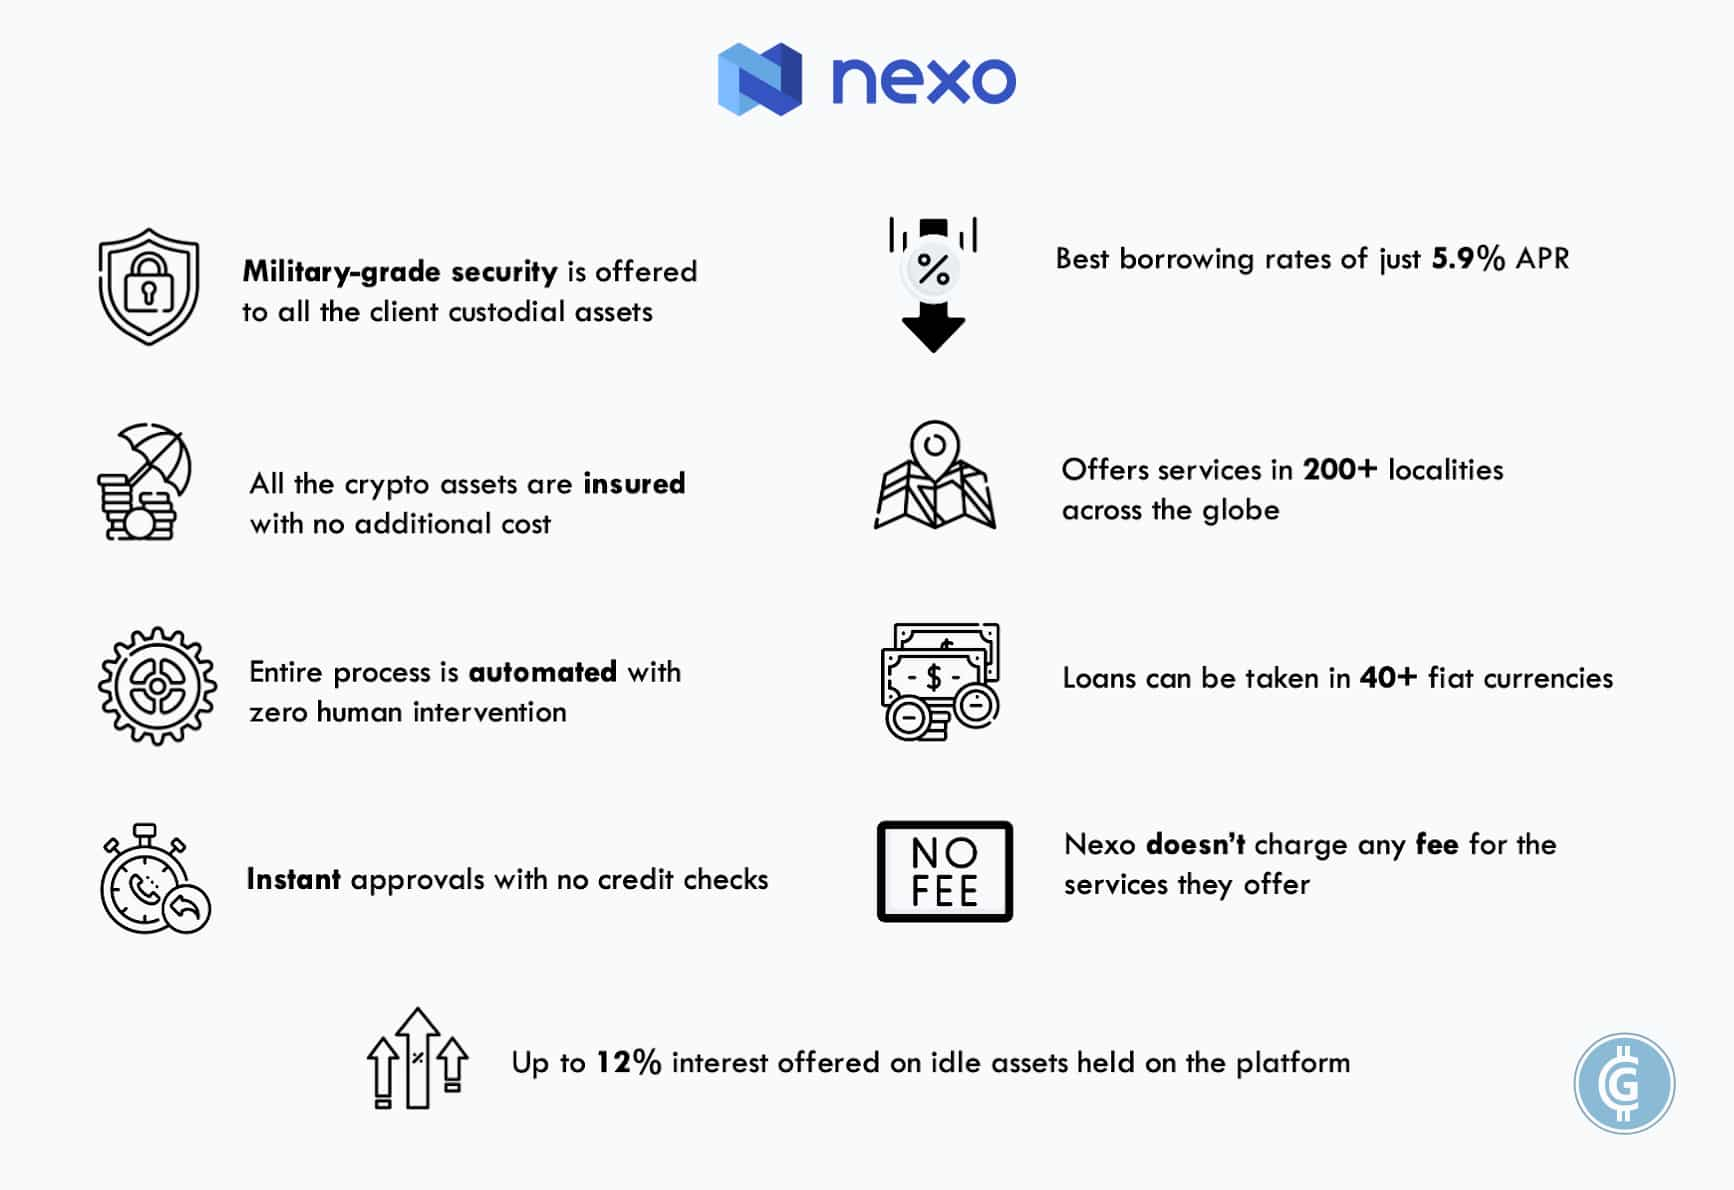 NEXO features